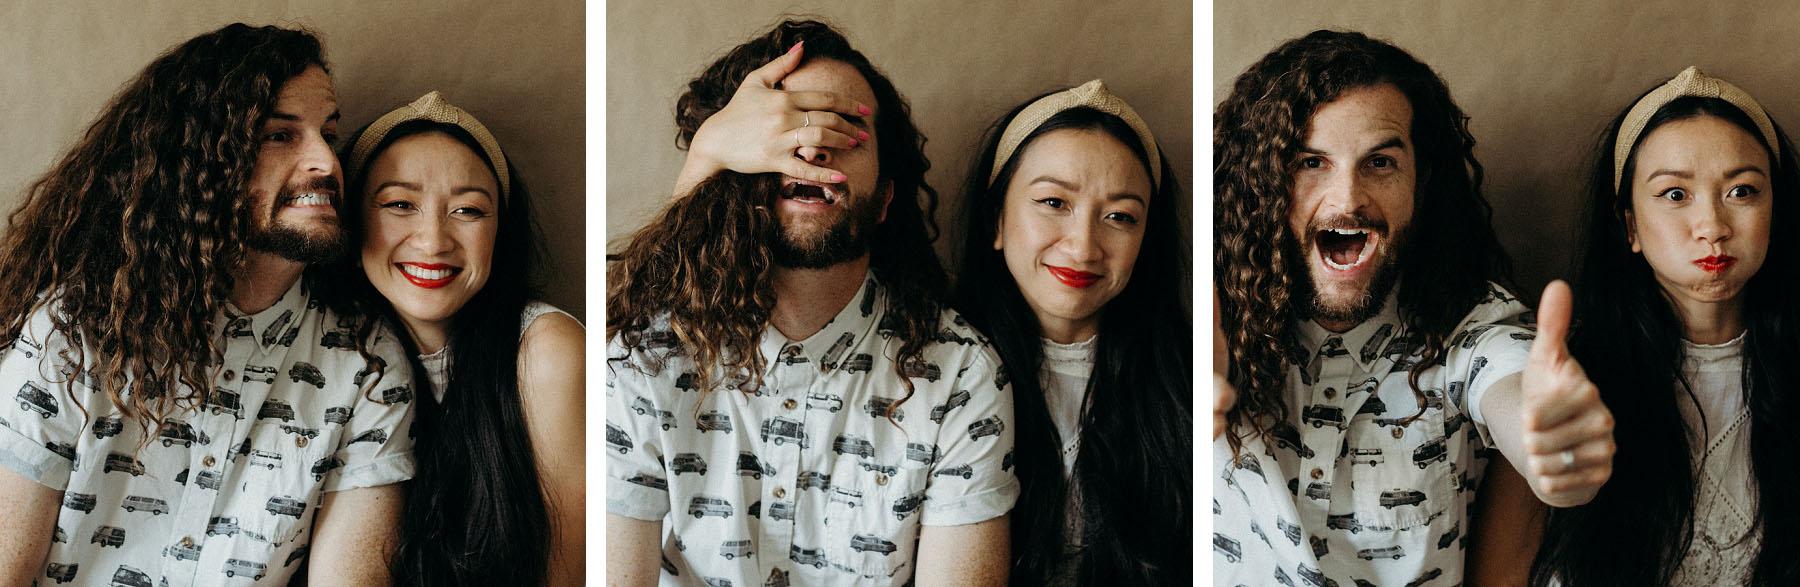 30 things about Joe+Kathrina